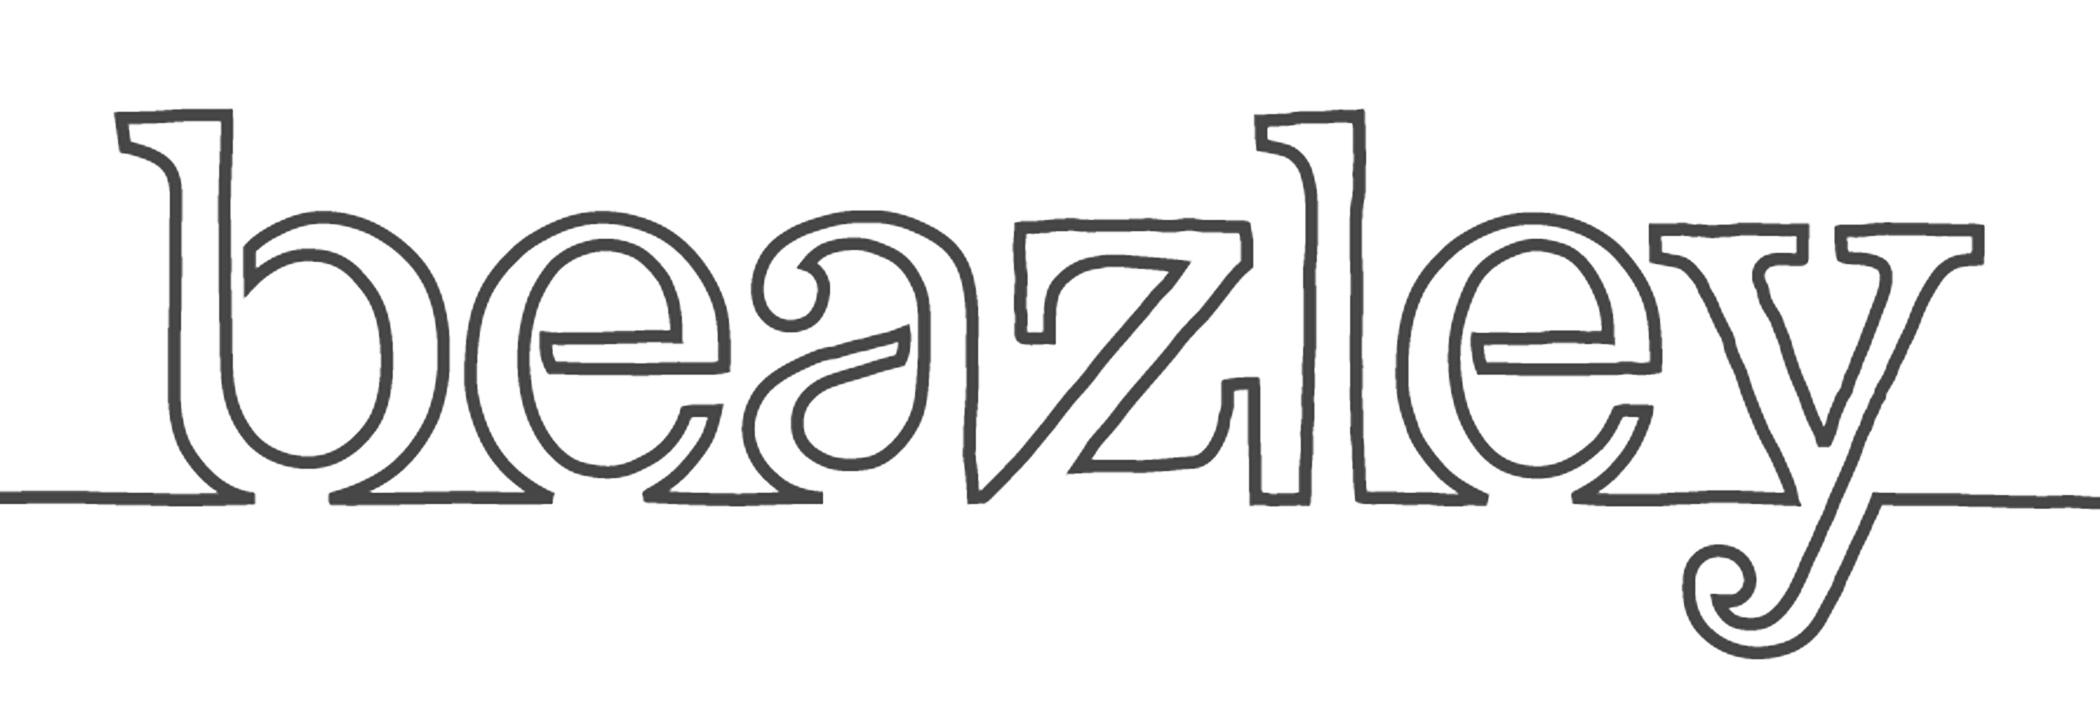 Beazley BW.jpg